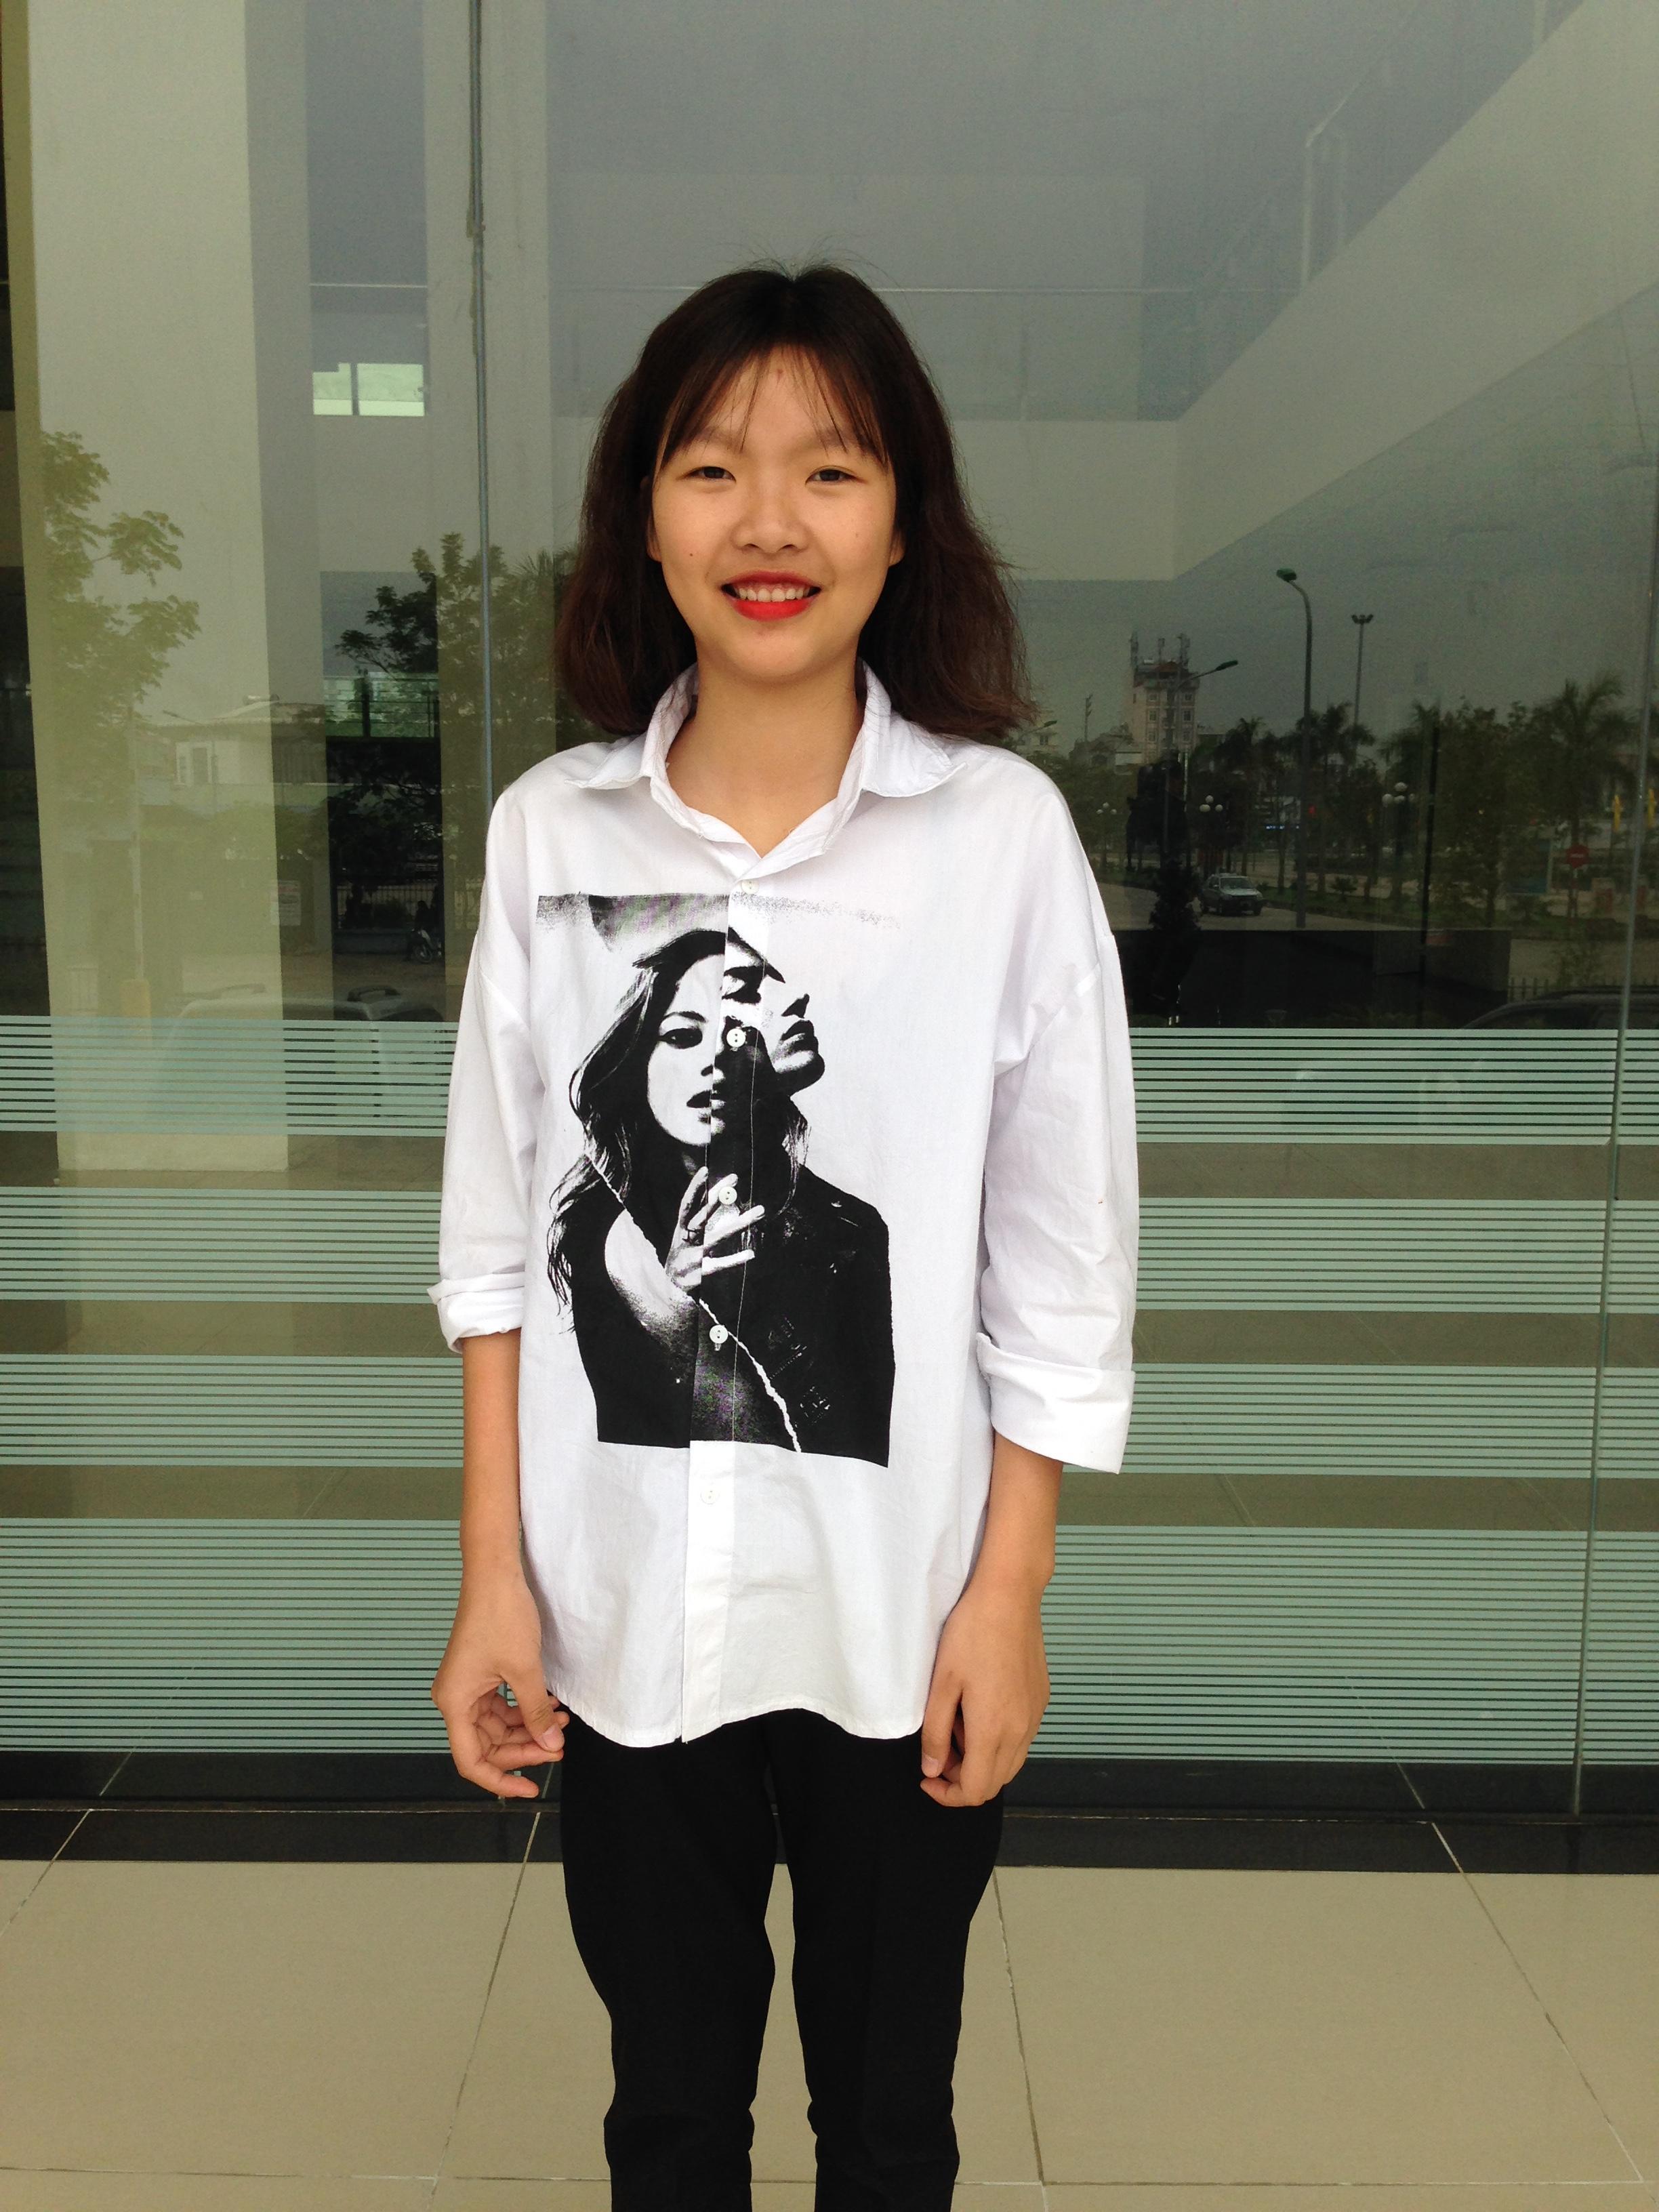 BOSCHER_TA Thi Yen